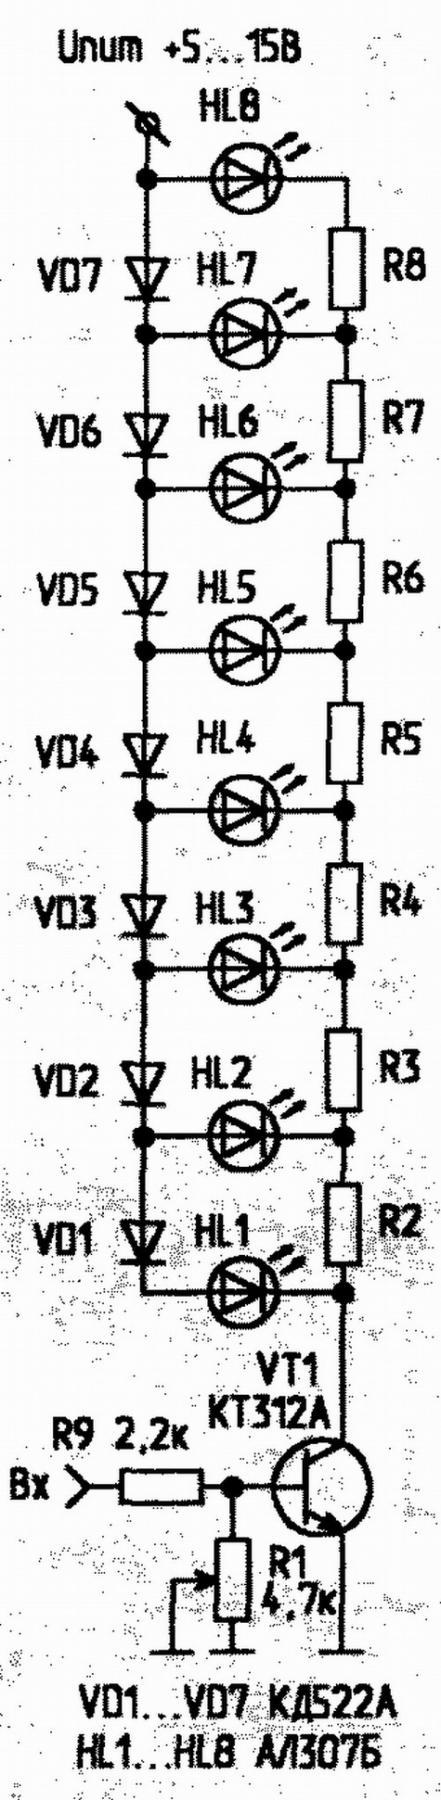 Амперметр на светодиодах своими руками схема фото 939